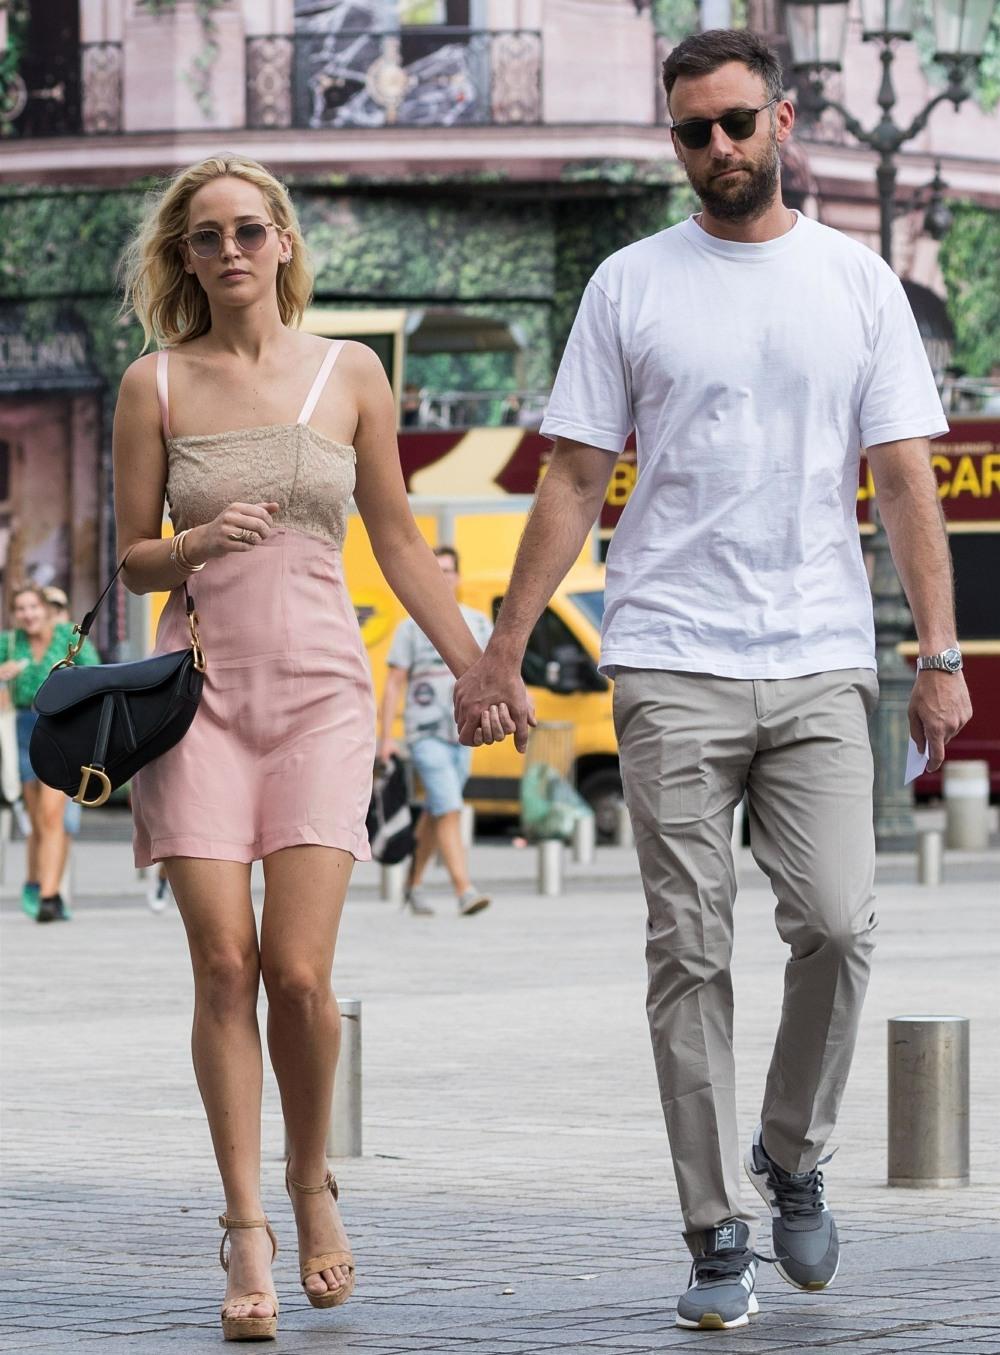 Jennifer Lawrence Is Engaged to Boyfriend Cooke Maroney